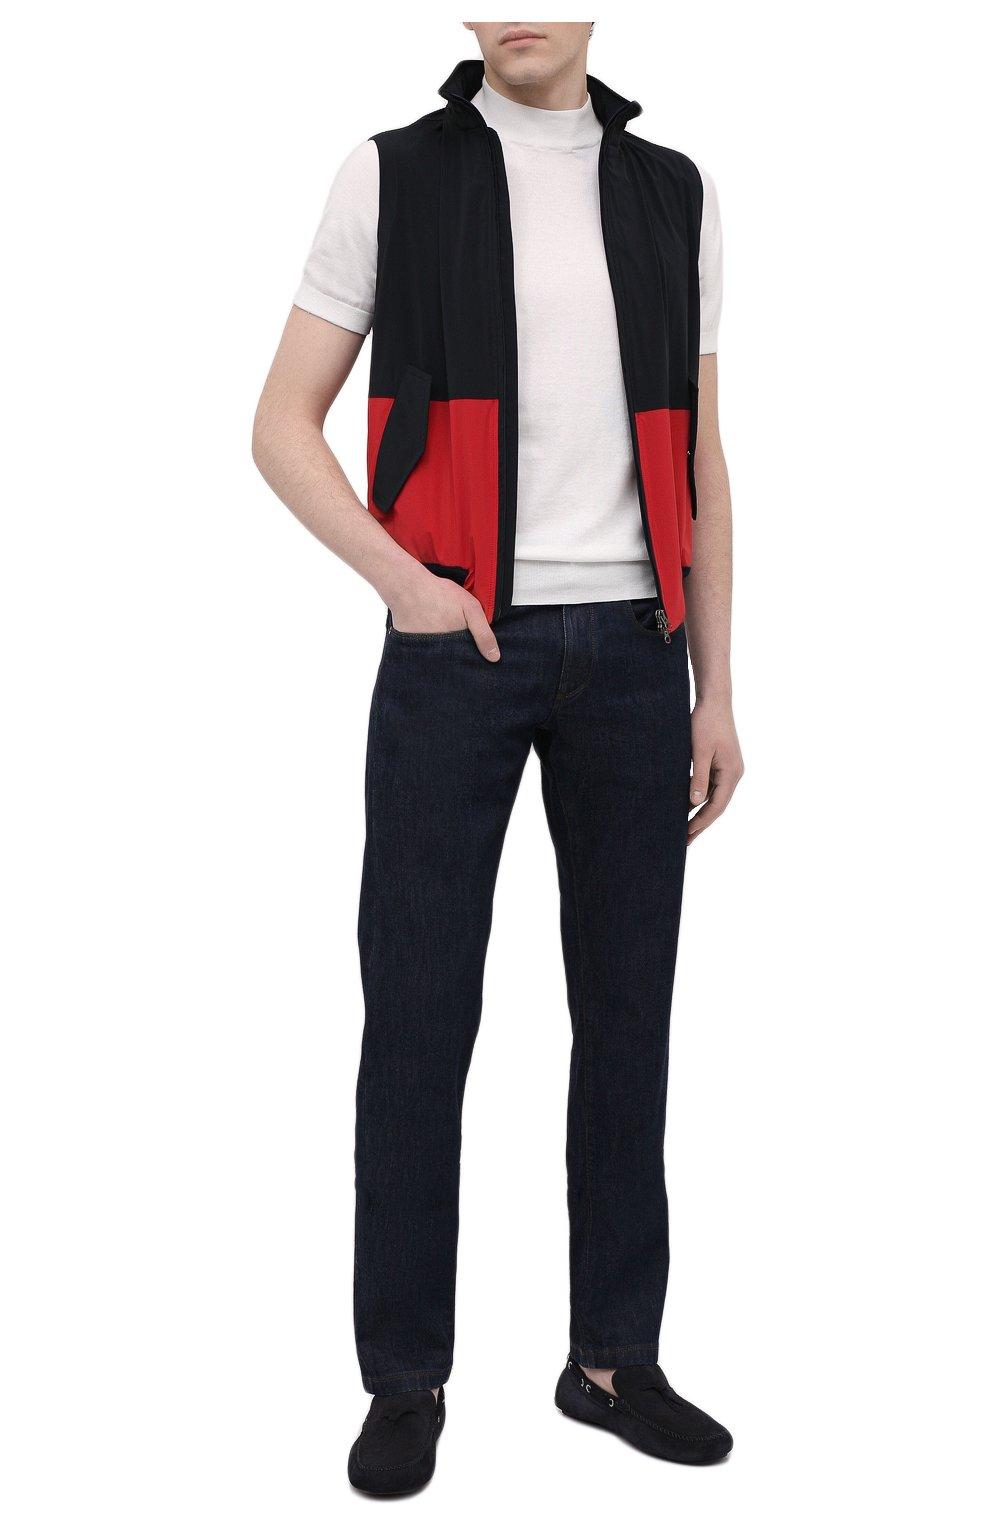 Мужской жилет KIRED темно-синего цвета, арт. WMAXBSMW6905003000   Фото 2 (Кросс-КТ: Куртка; Материал внешний: Синтетический материал; Длина (верхняя одежда): Короткие; Стили: Кэжуэл)